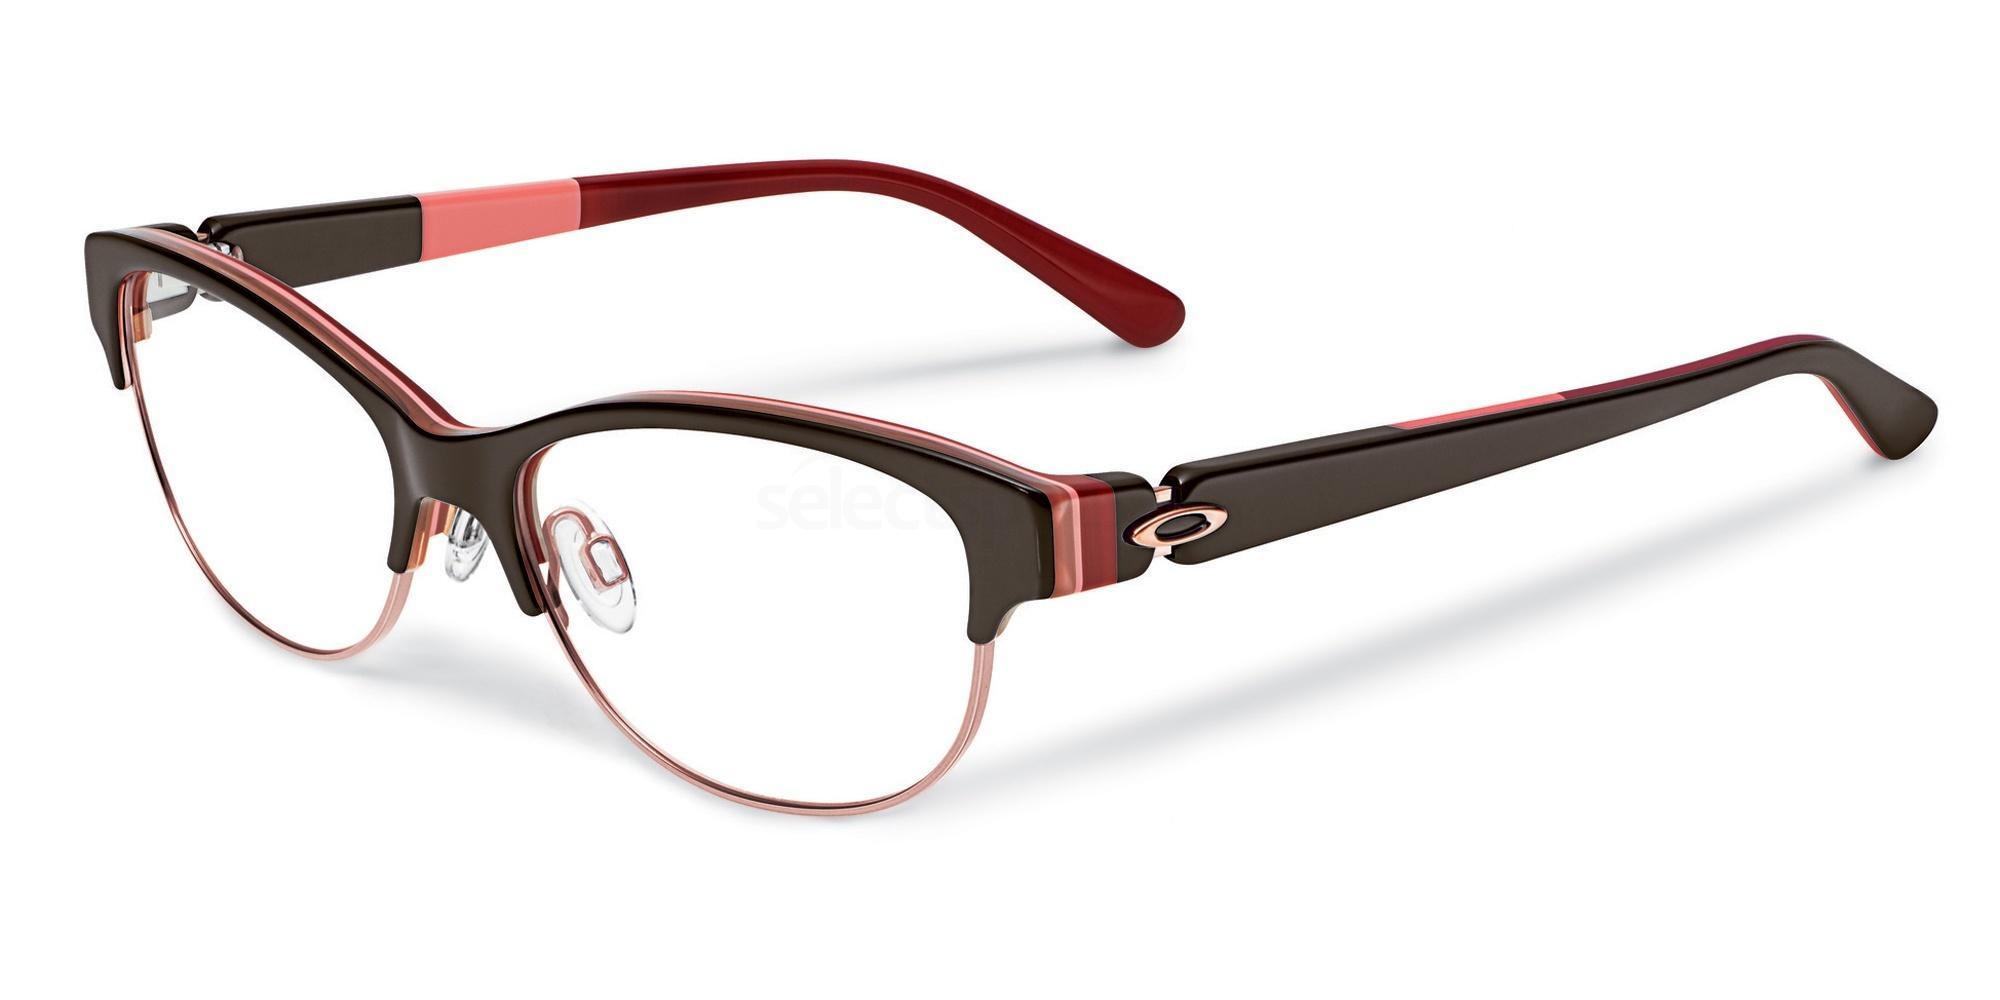 110805 OX1108 THROWBACK Glasses, Oakley Ladies